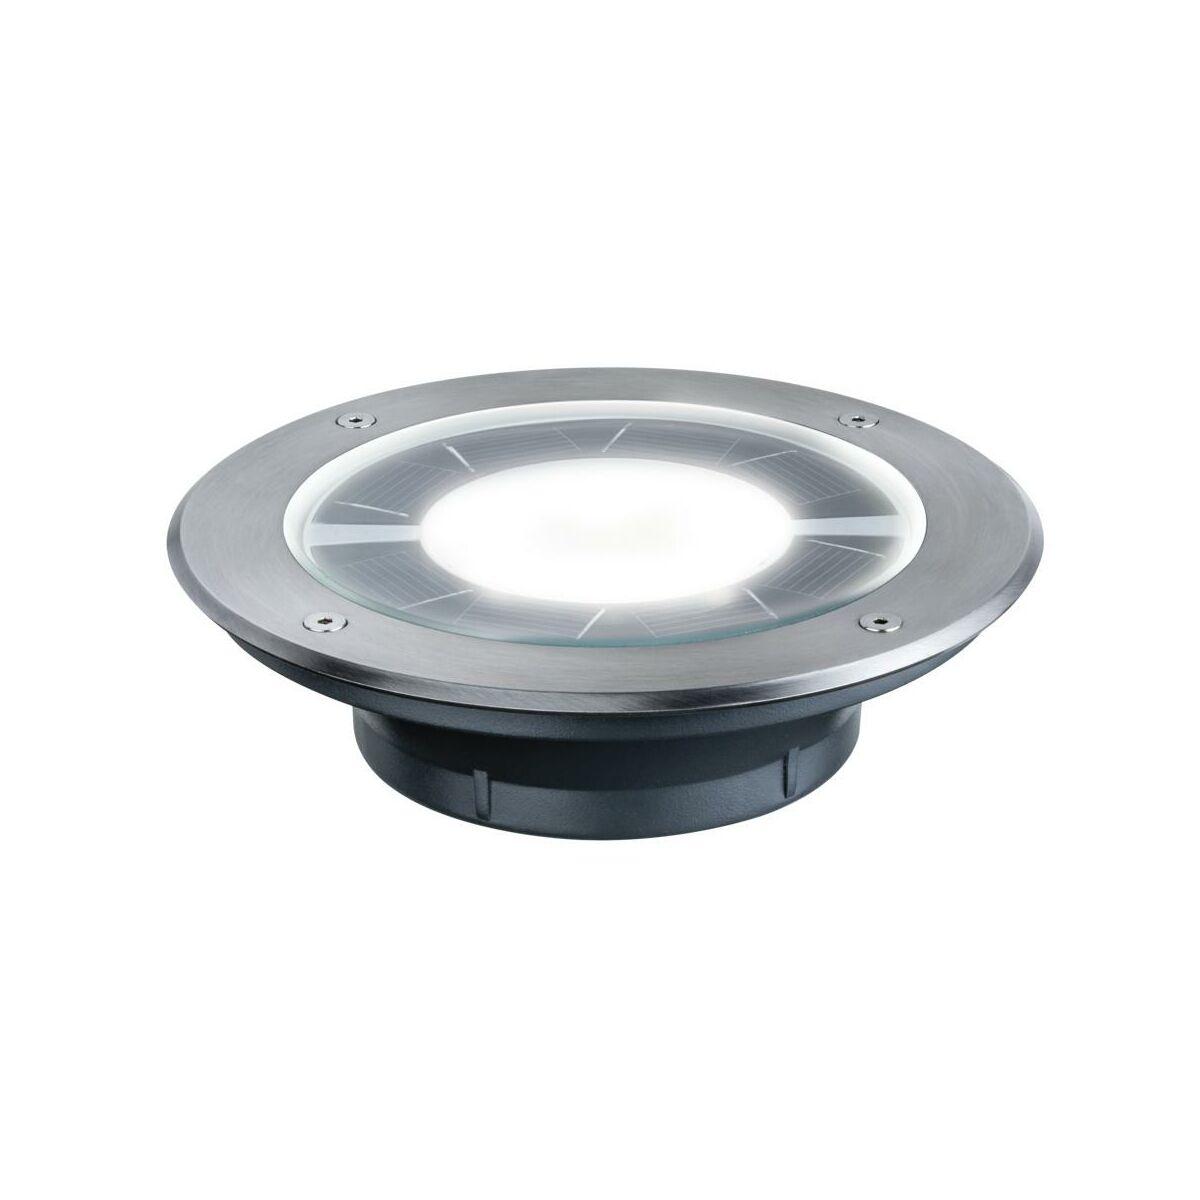 Oprawa chodnikowa solar pandora led lampy solarne w - Guirnalda solar leroy merlin ...